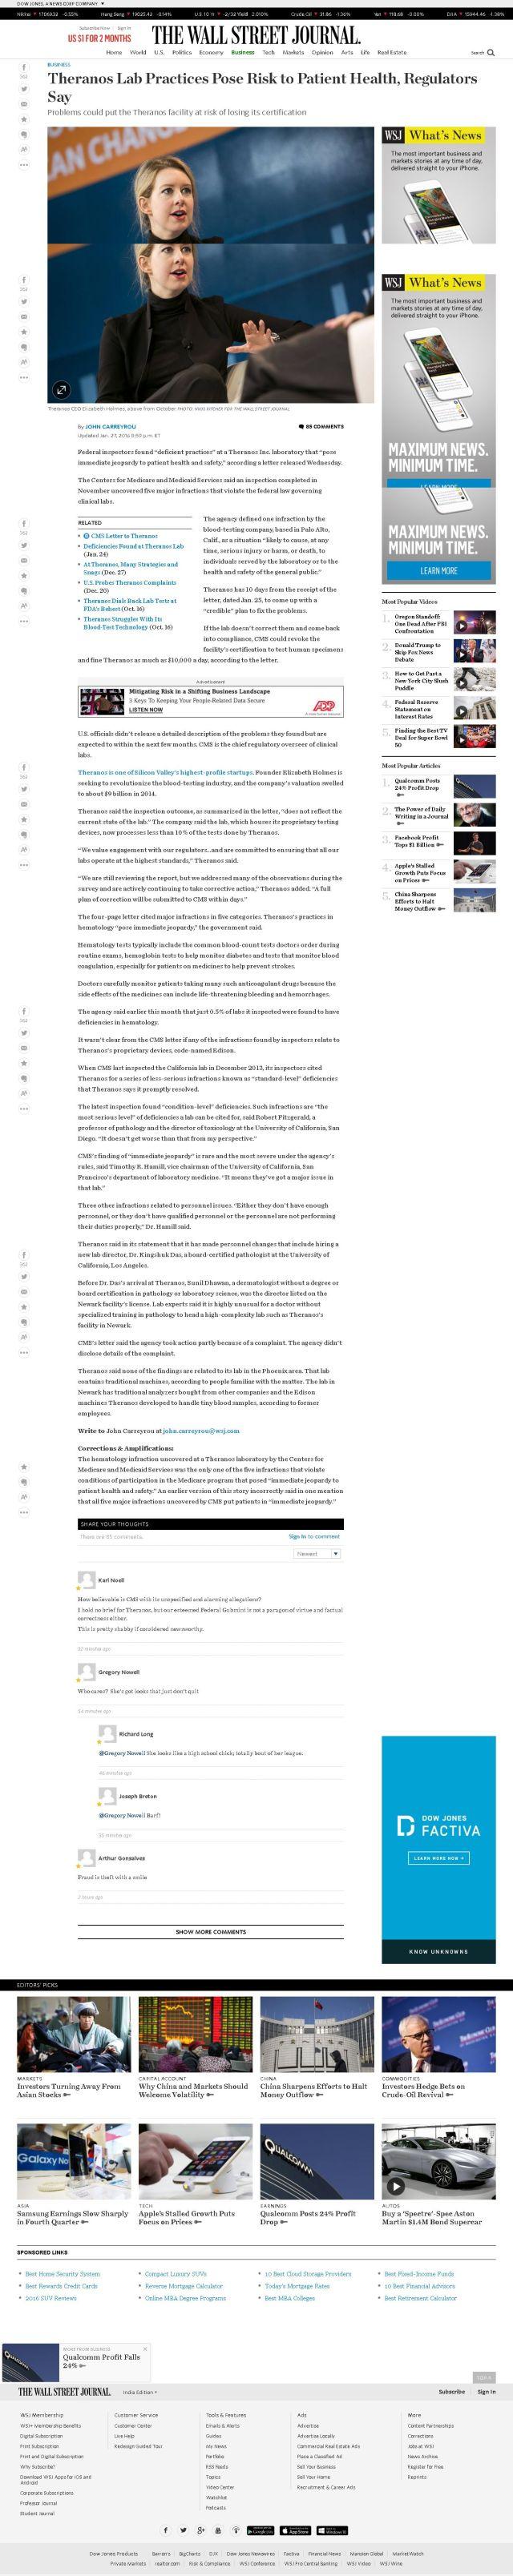 Unlocked WSJ Article Screenshot